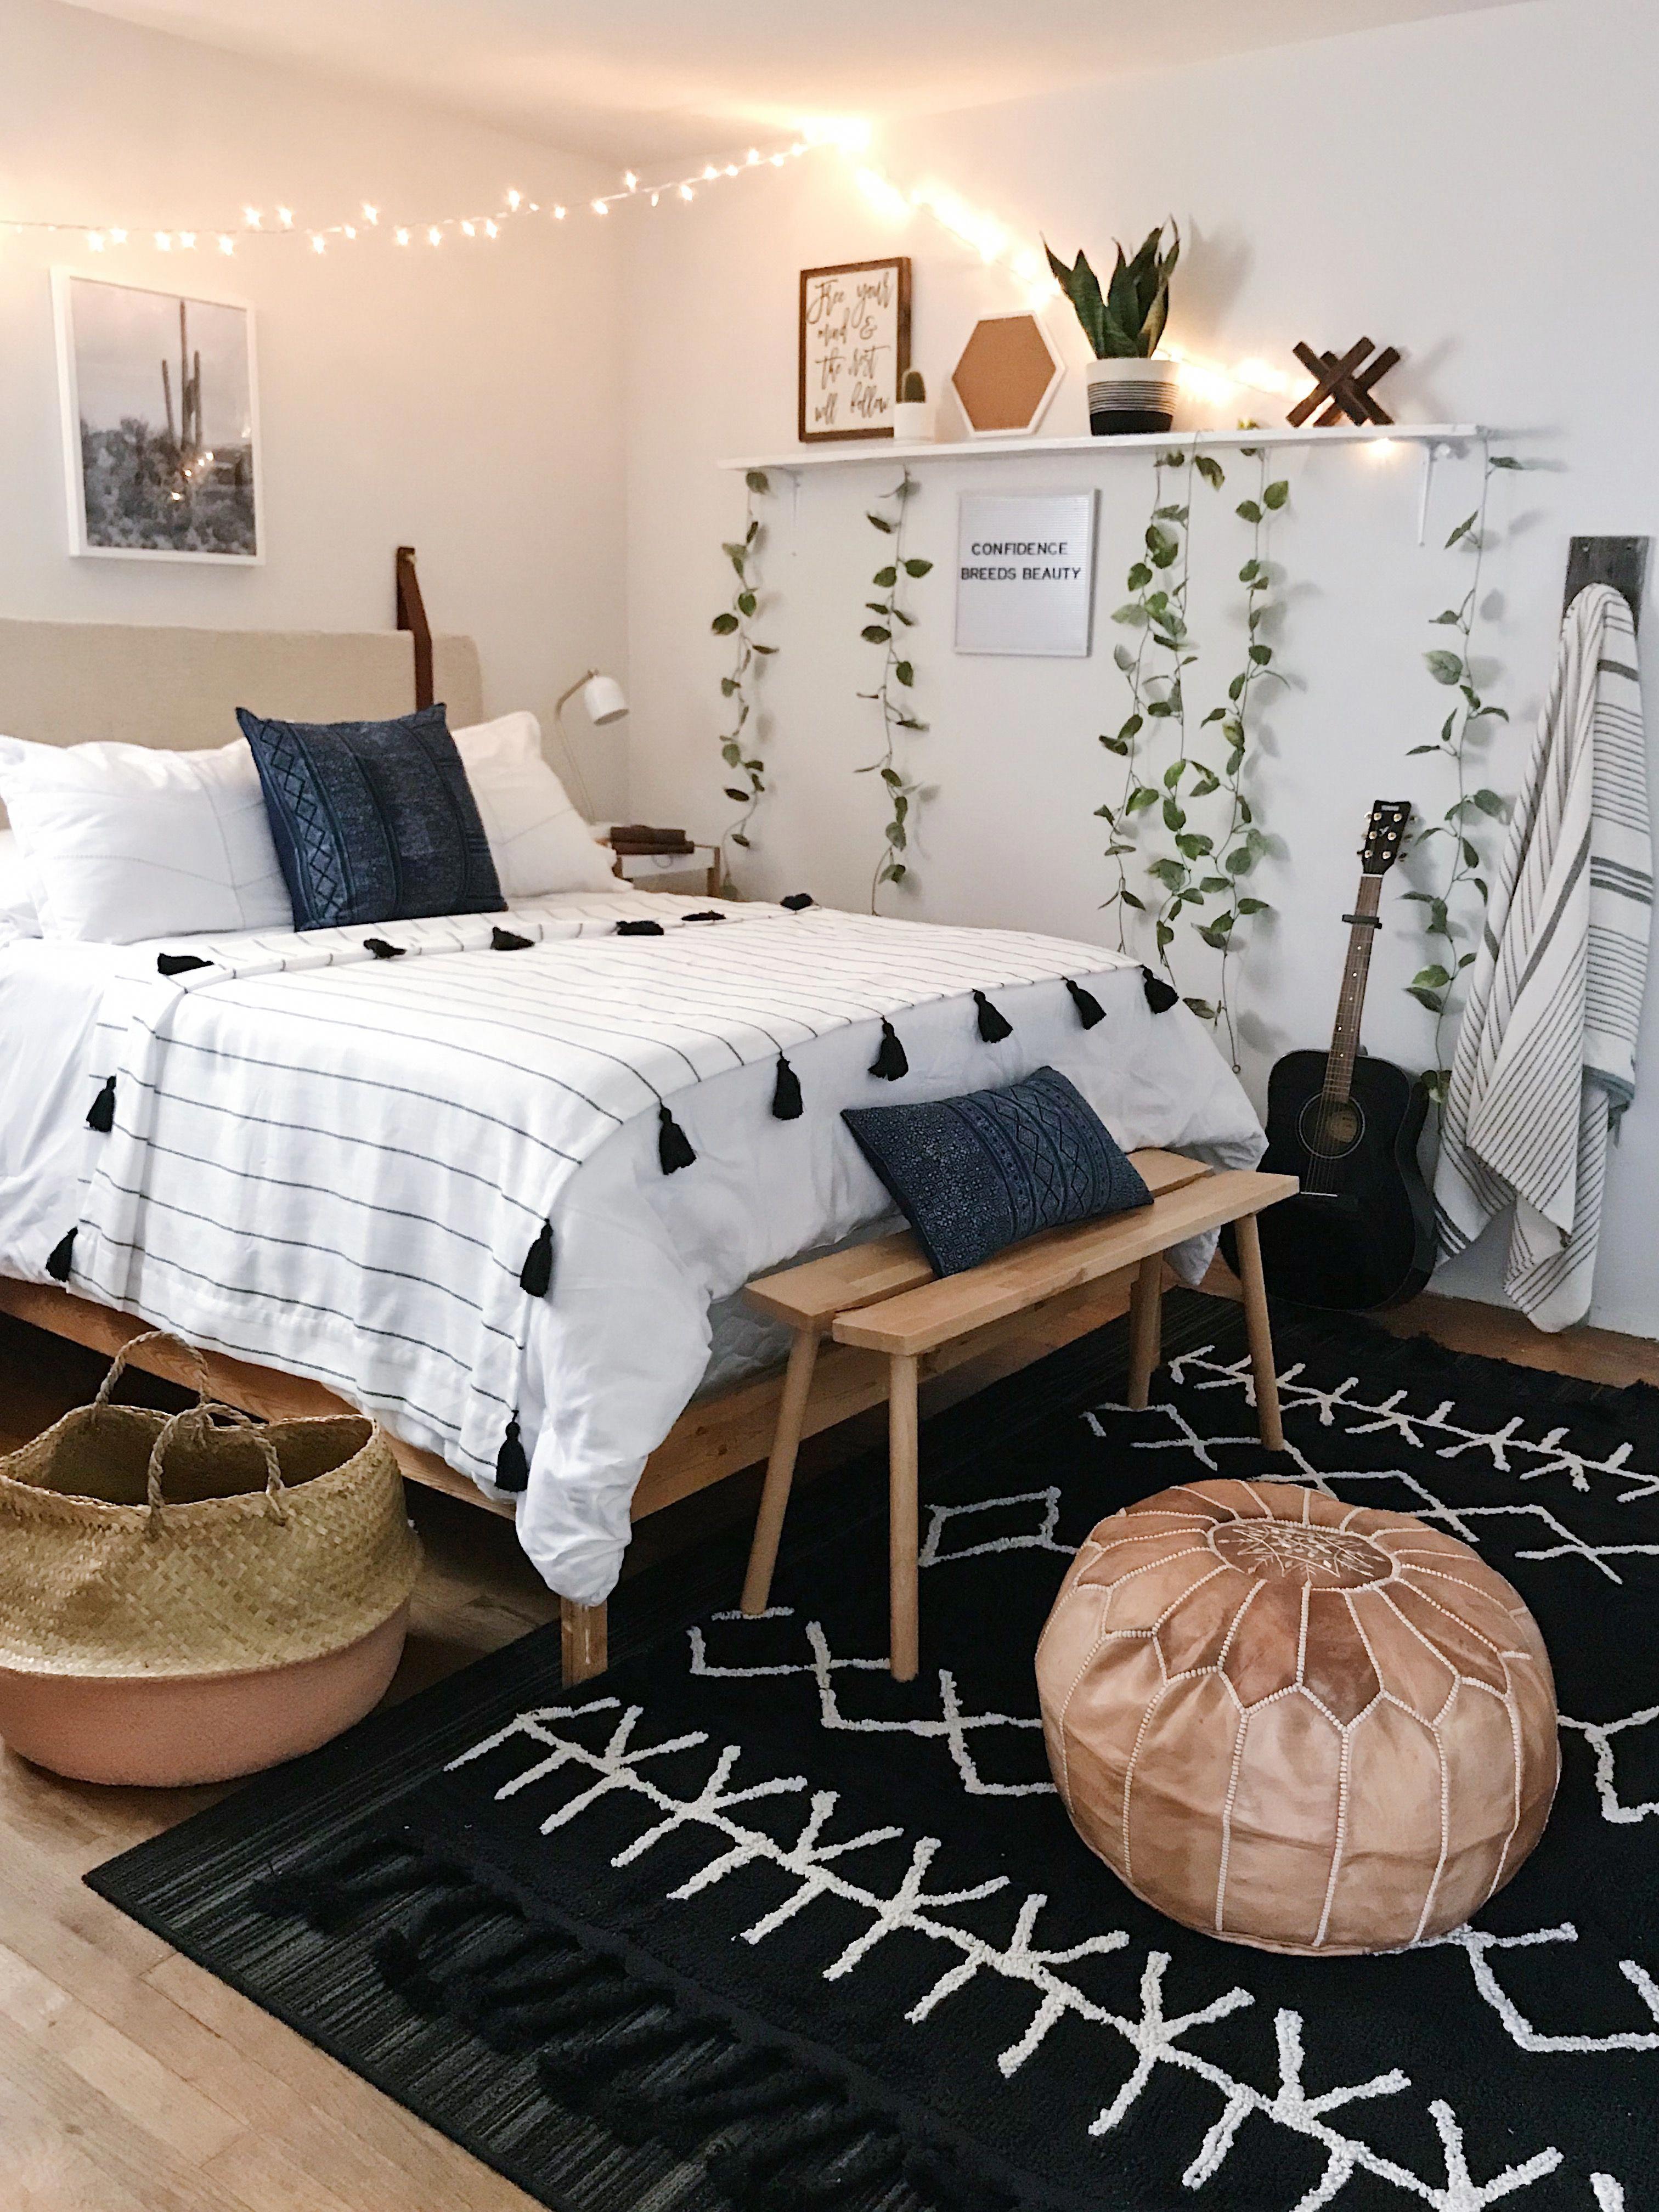 Best Bedroom Decor With Bereber Black Roomdecor Inspo Ecofriendly Washablerugs Lorenacana Room Inspiration Bedroom Dorm Room Decor Bedroom Decor